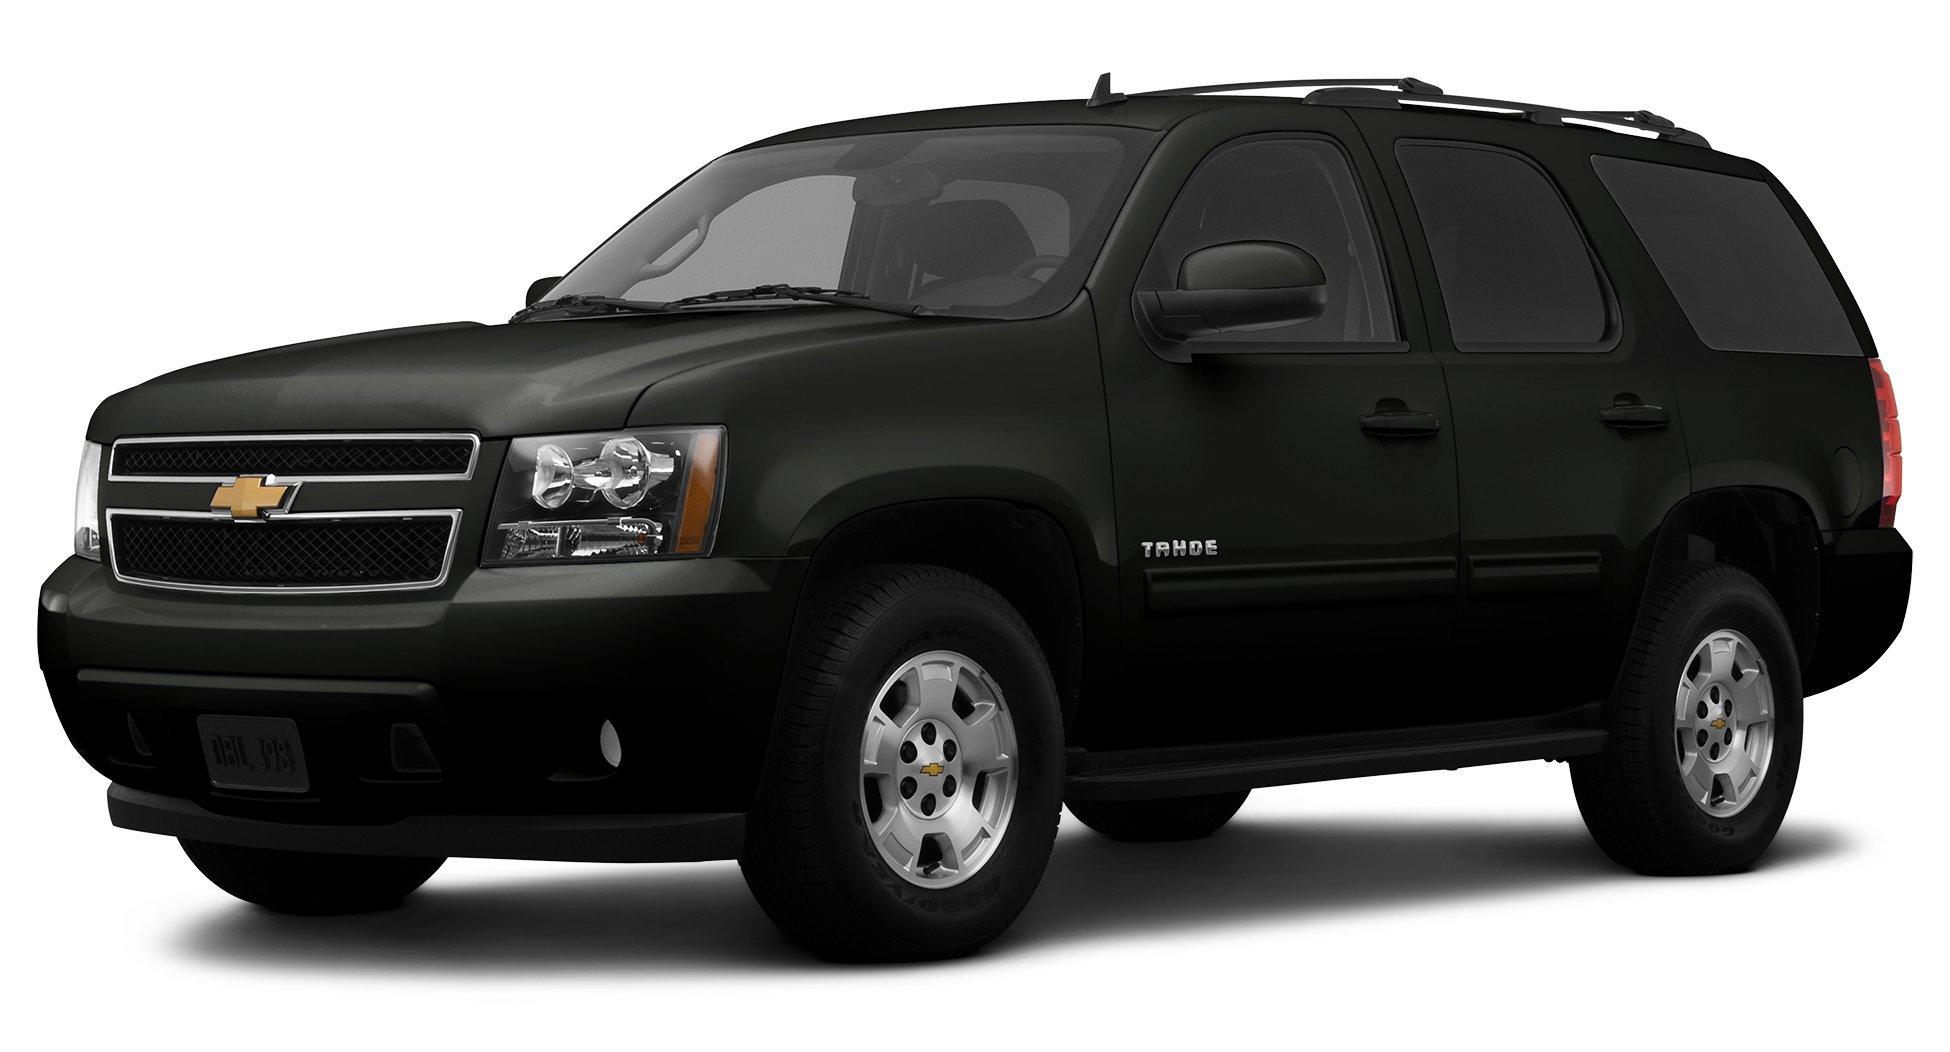 2012 Chevrolet Suburban 2500